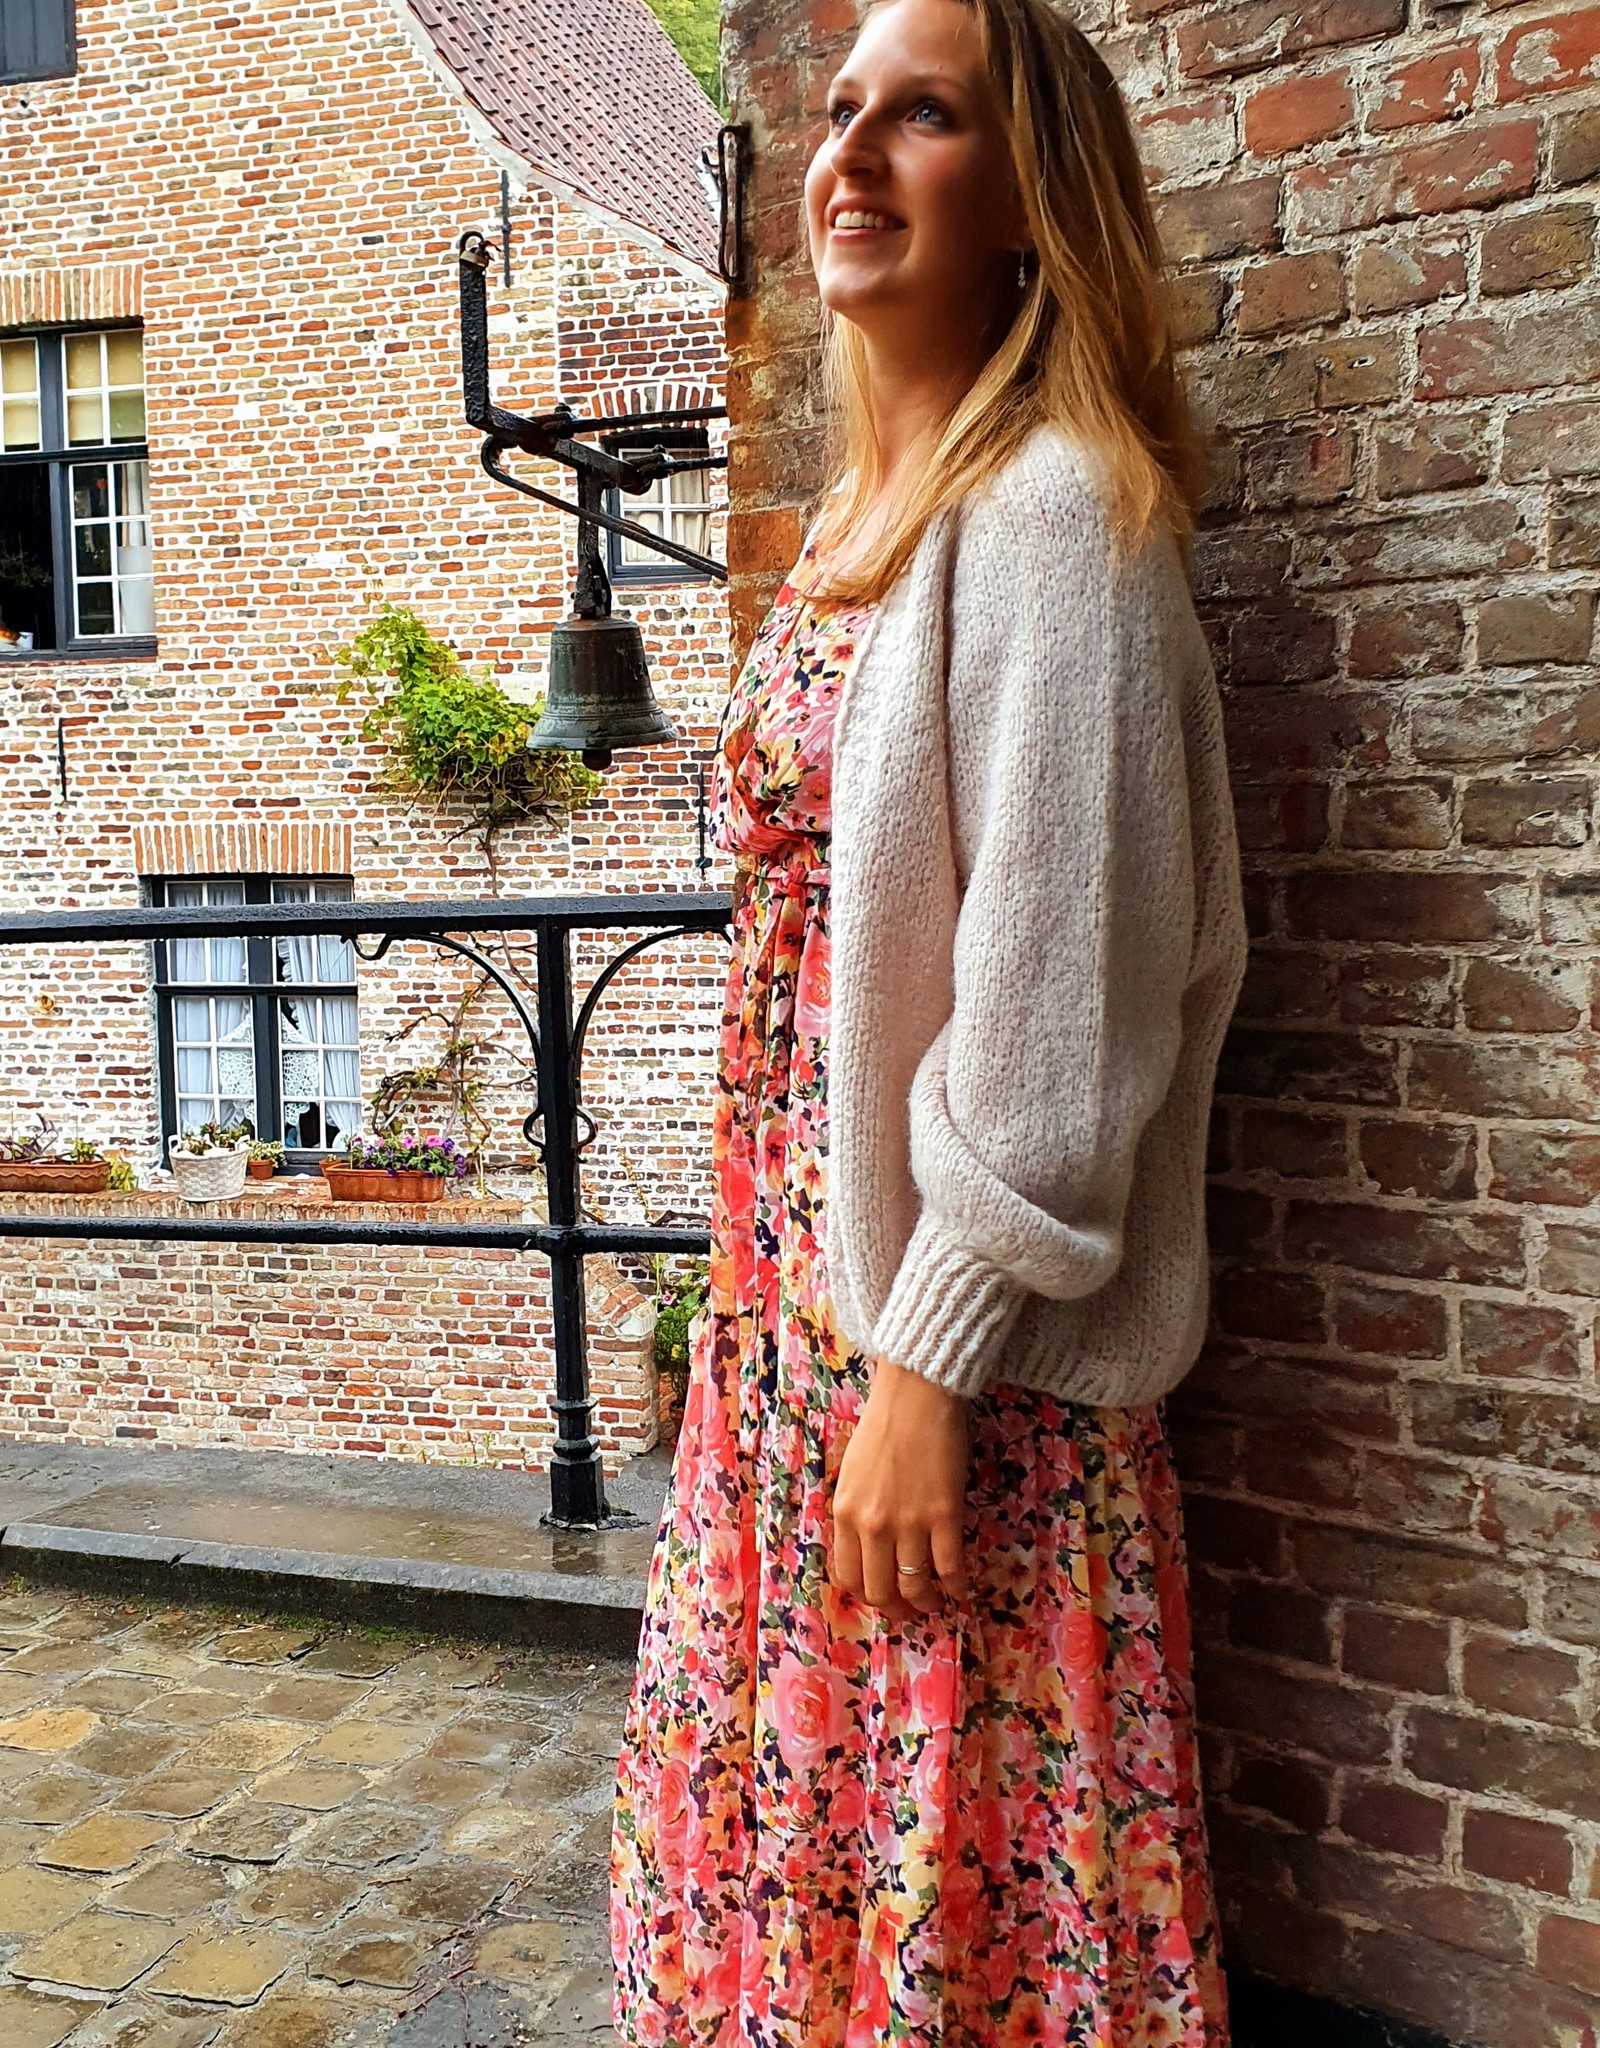 Colourful autumn dress